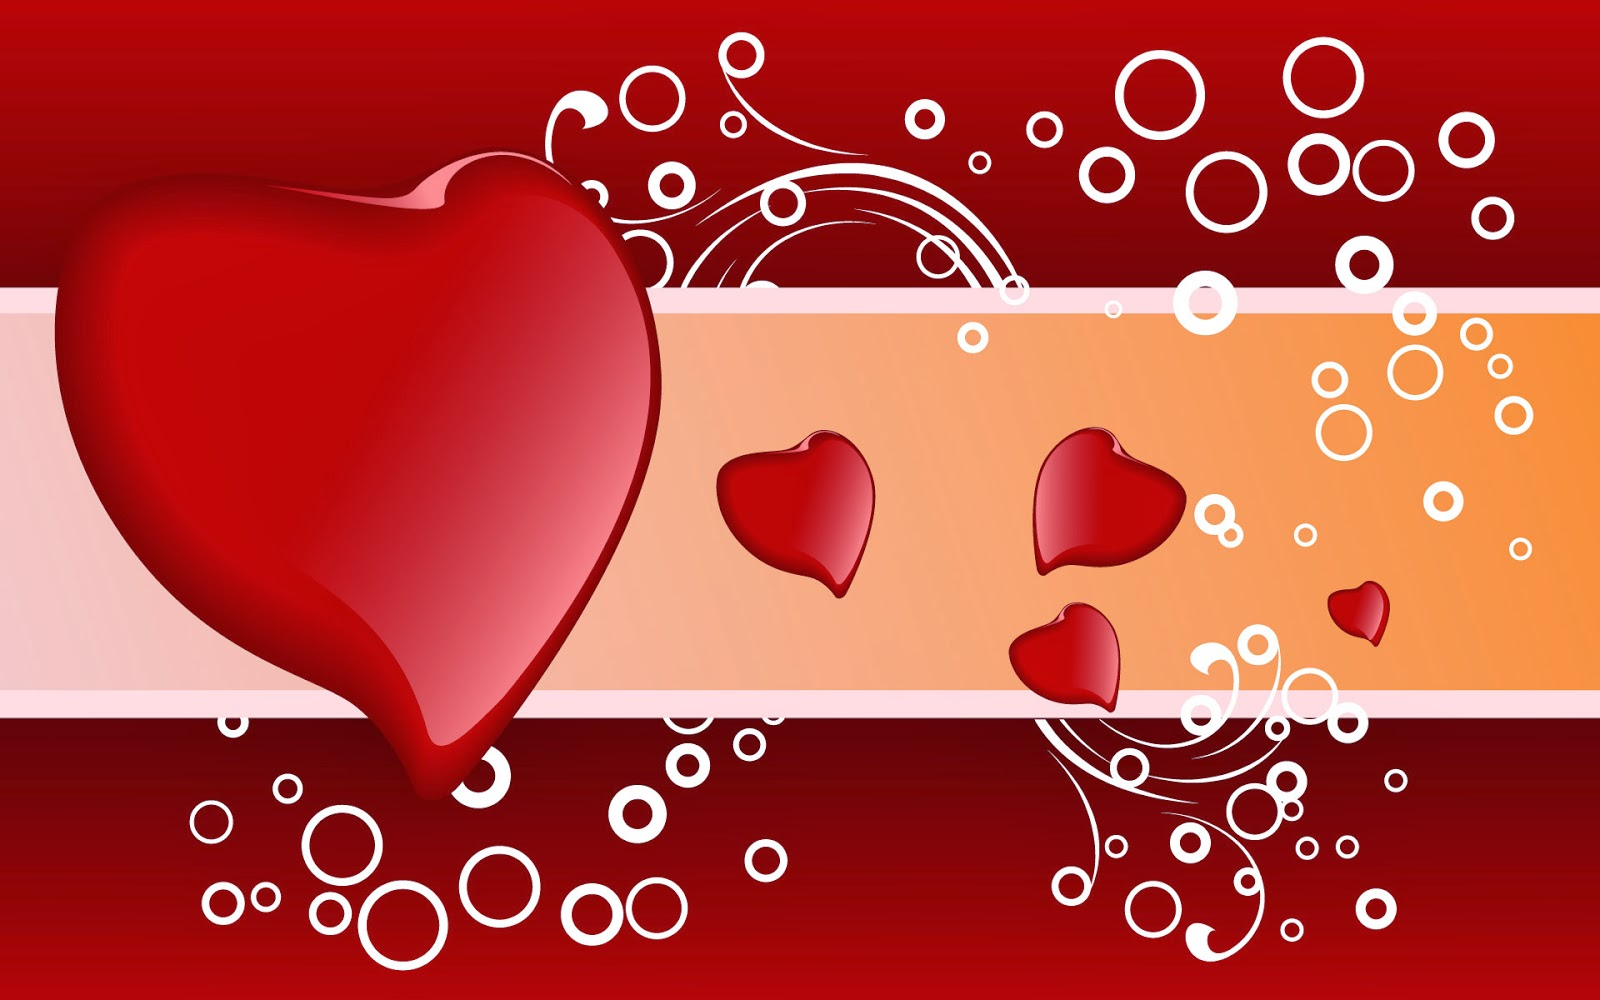 valentines day wallpaper 2014